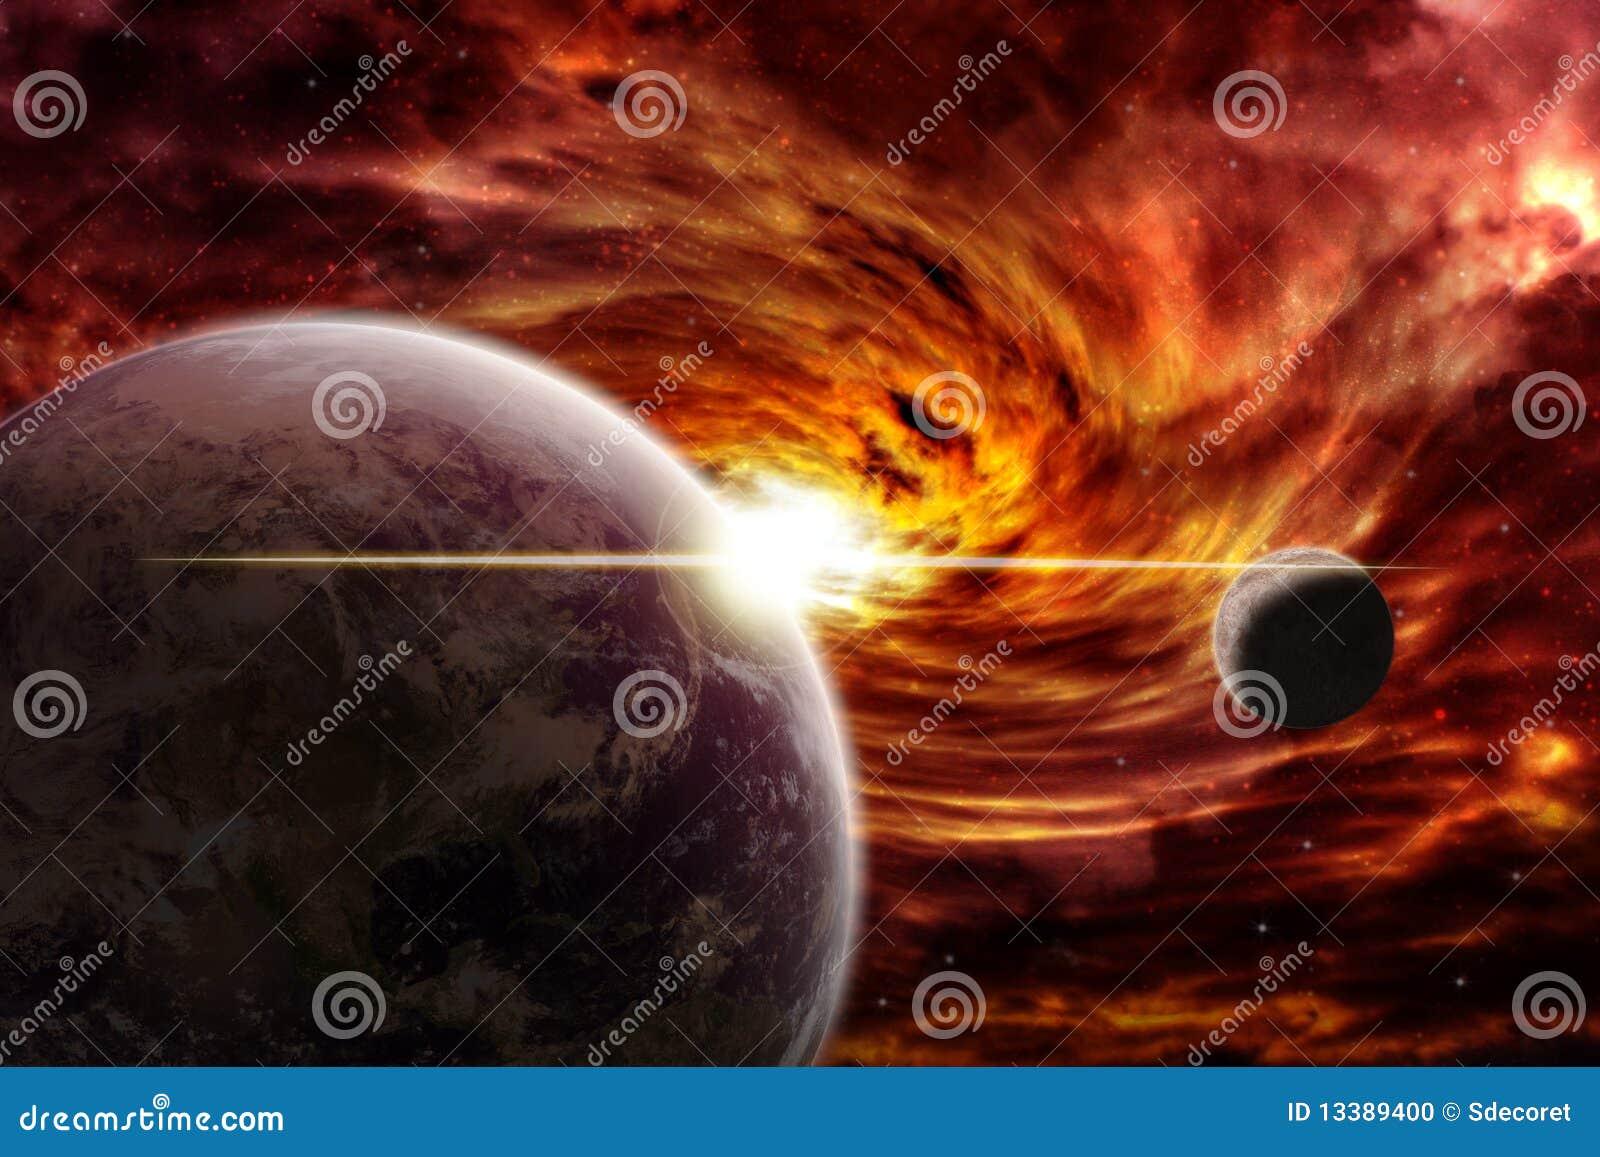 Roter Nebelfleck über der Planetenerde